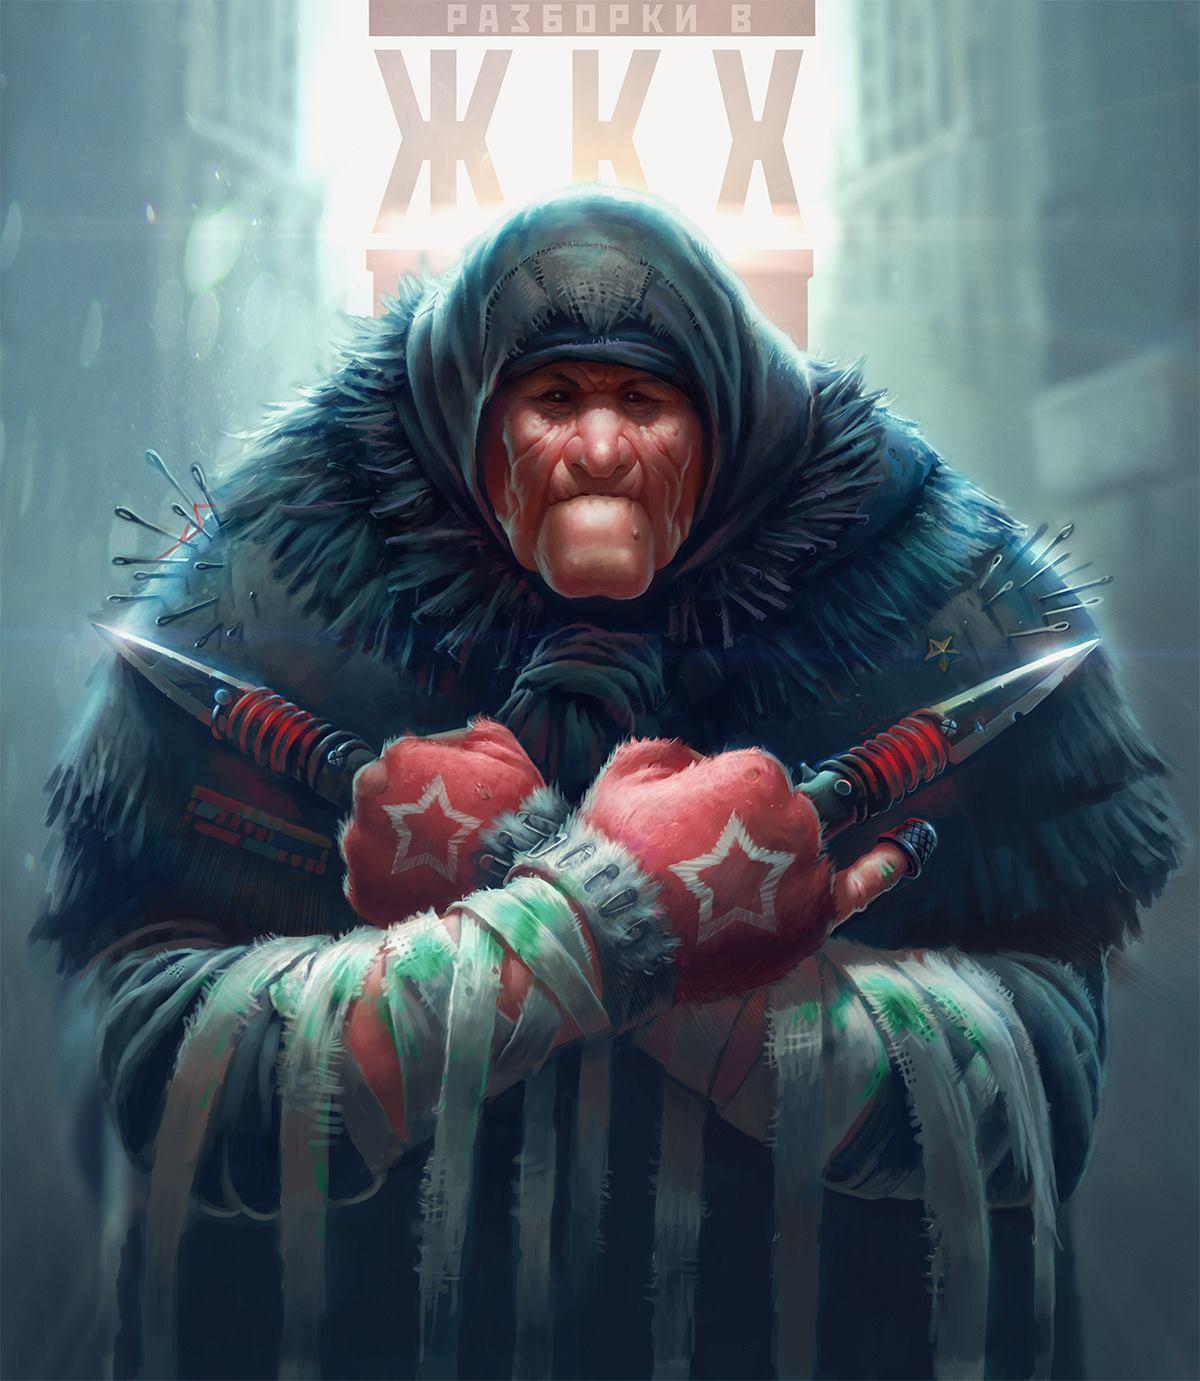 Harsh Russian post-apocalyptic grannies by Eduard Nabiullin - 5